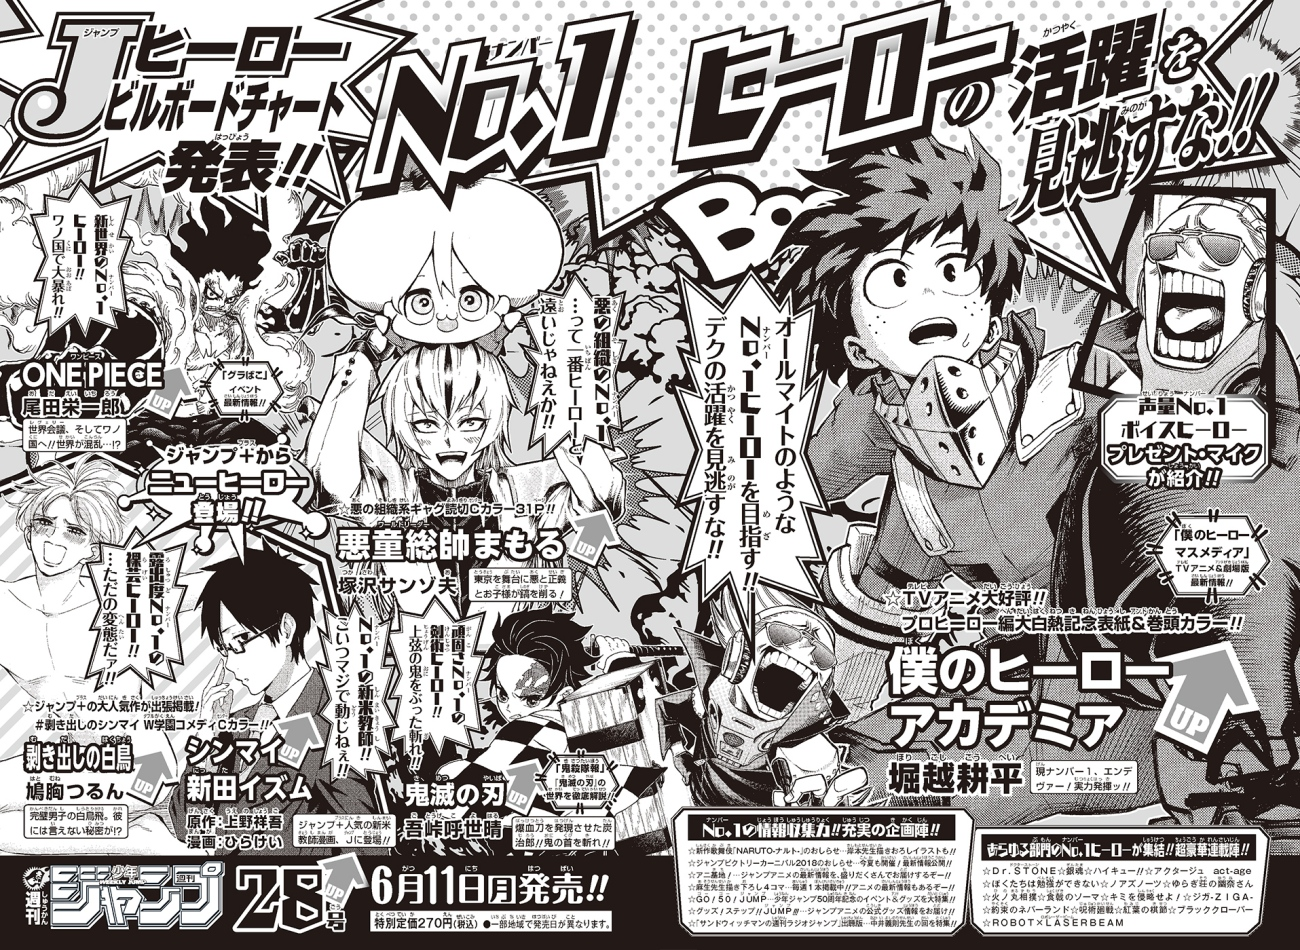 Dans le Weekly Shonen Jump 2018 #28